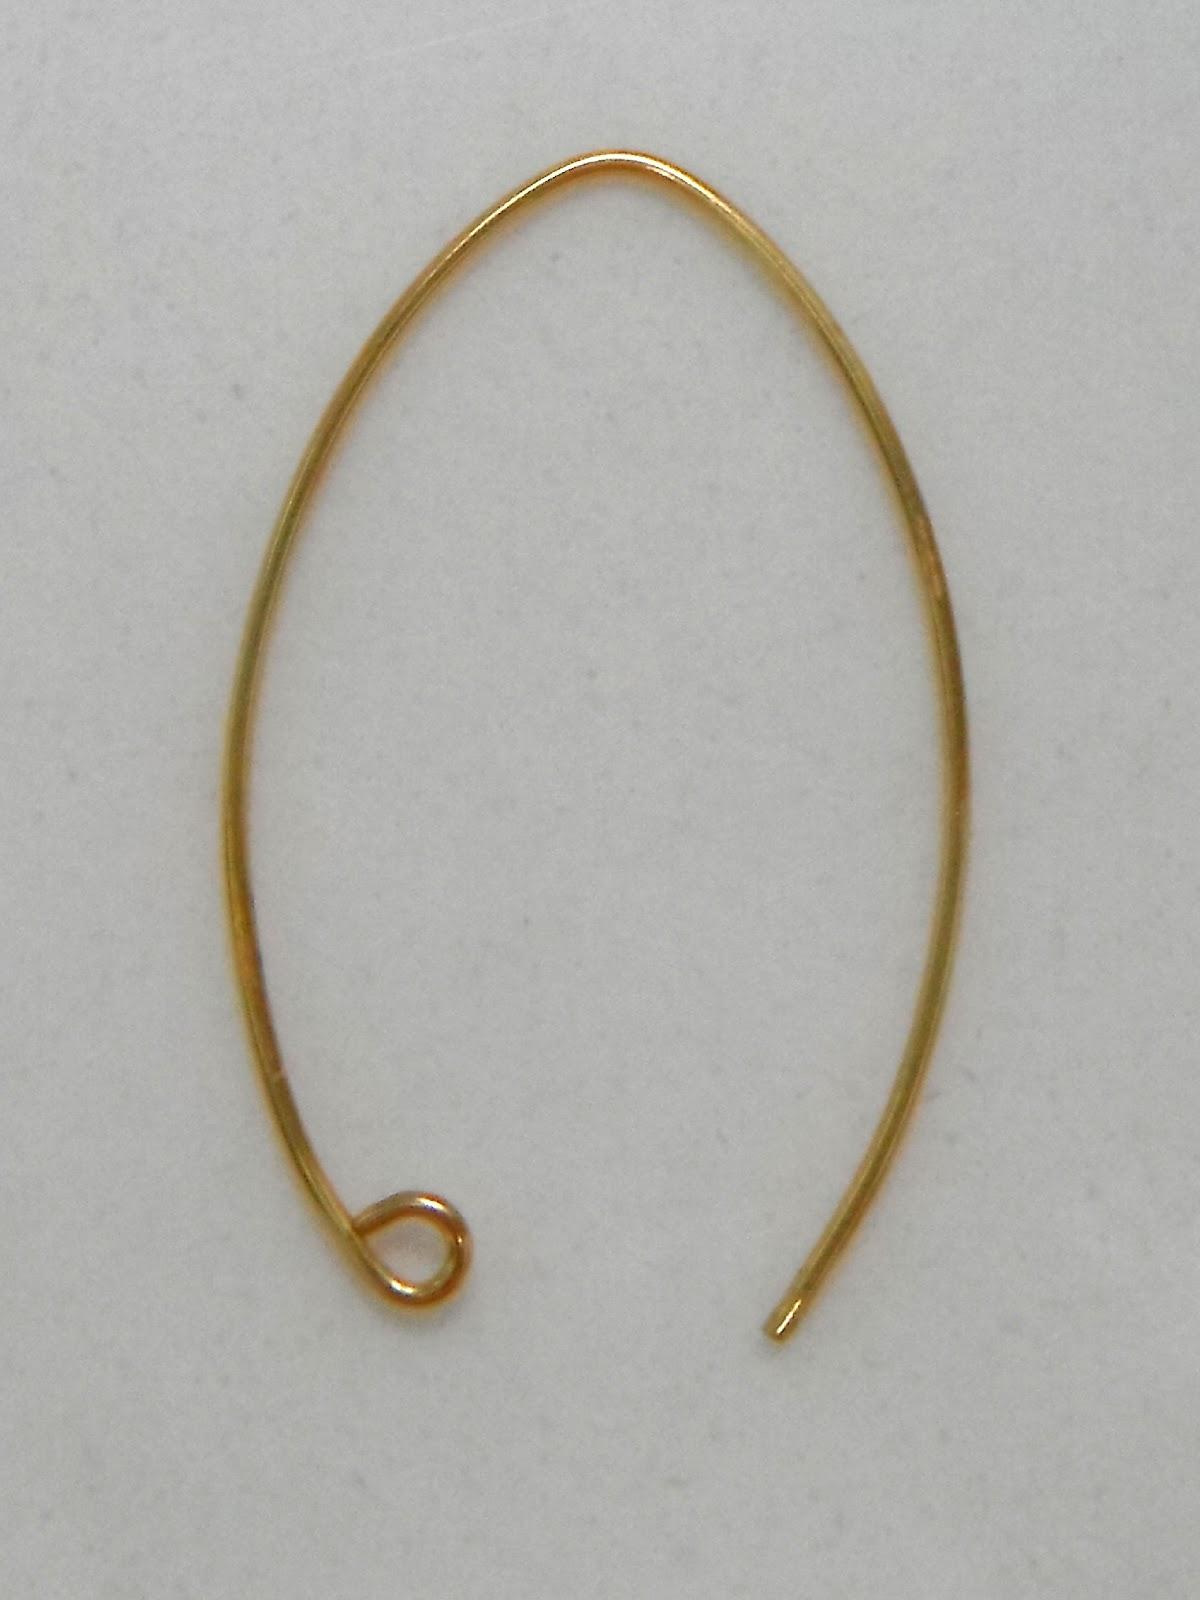 non*sense..: earring hook & hoop how-to